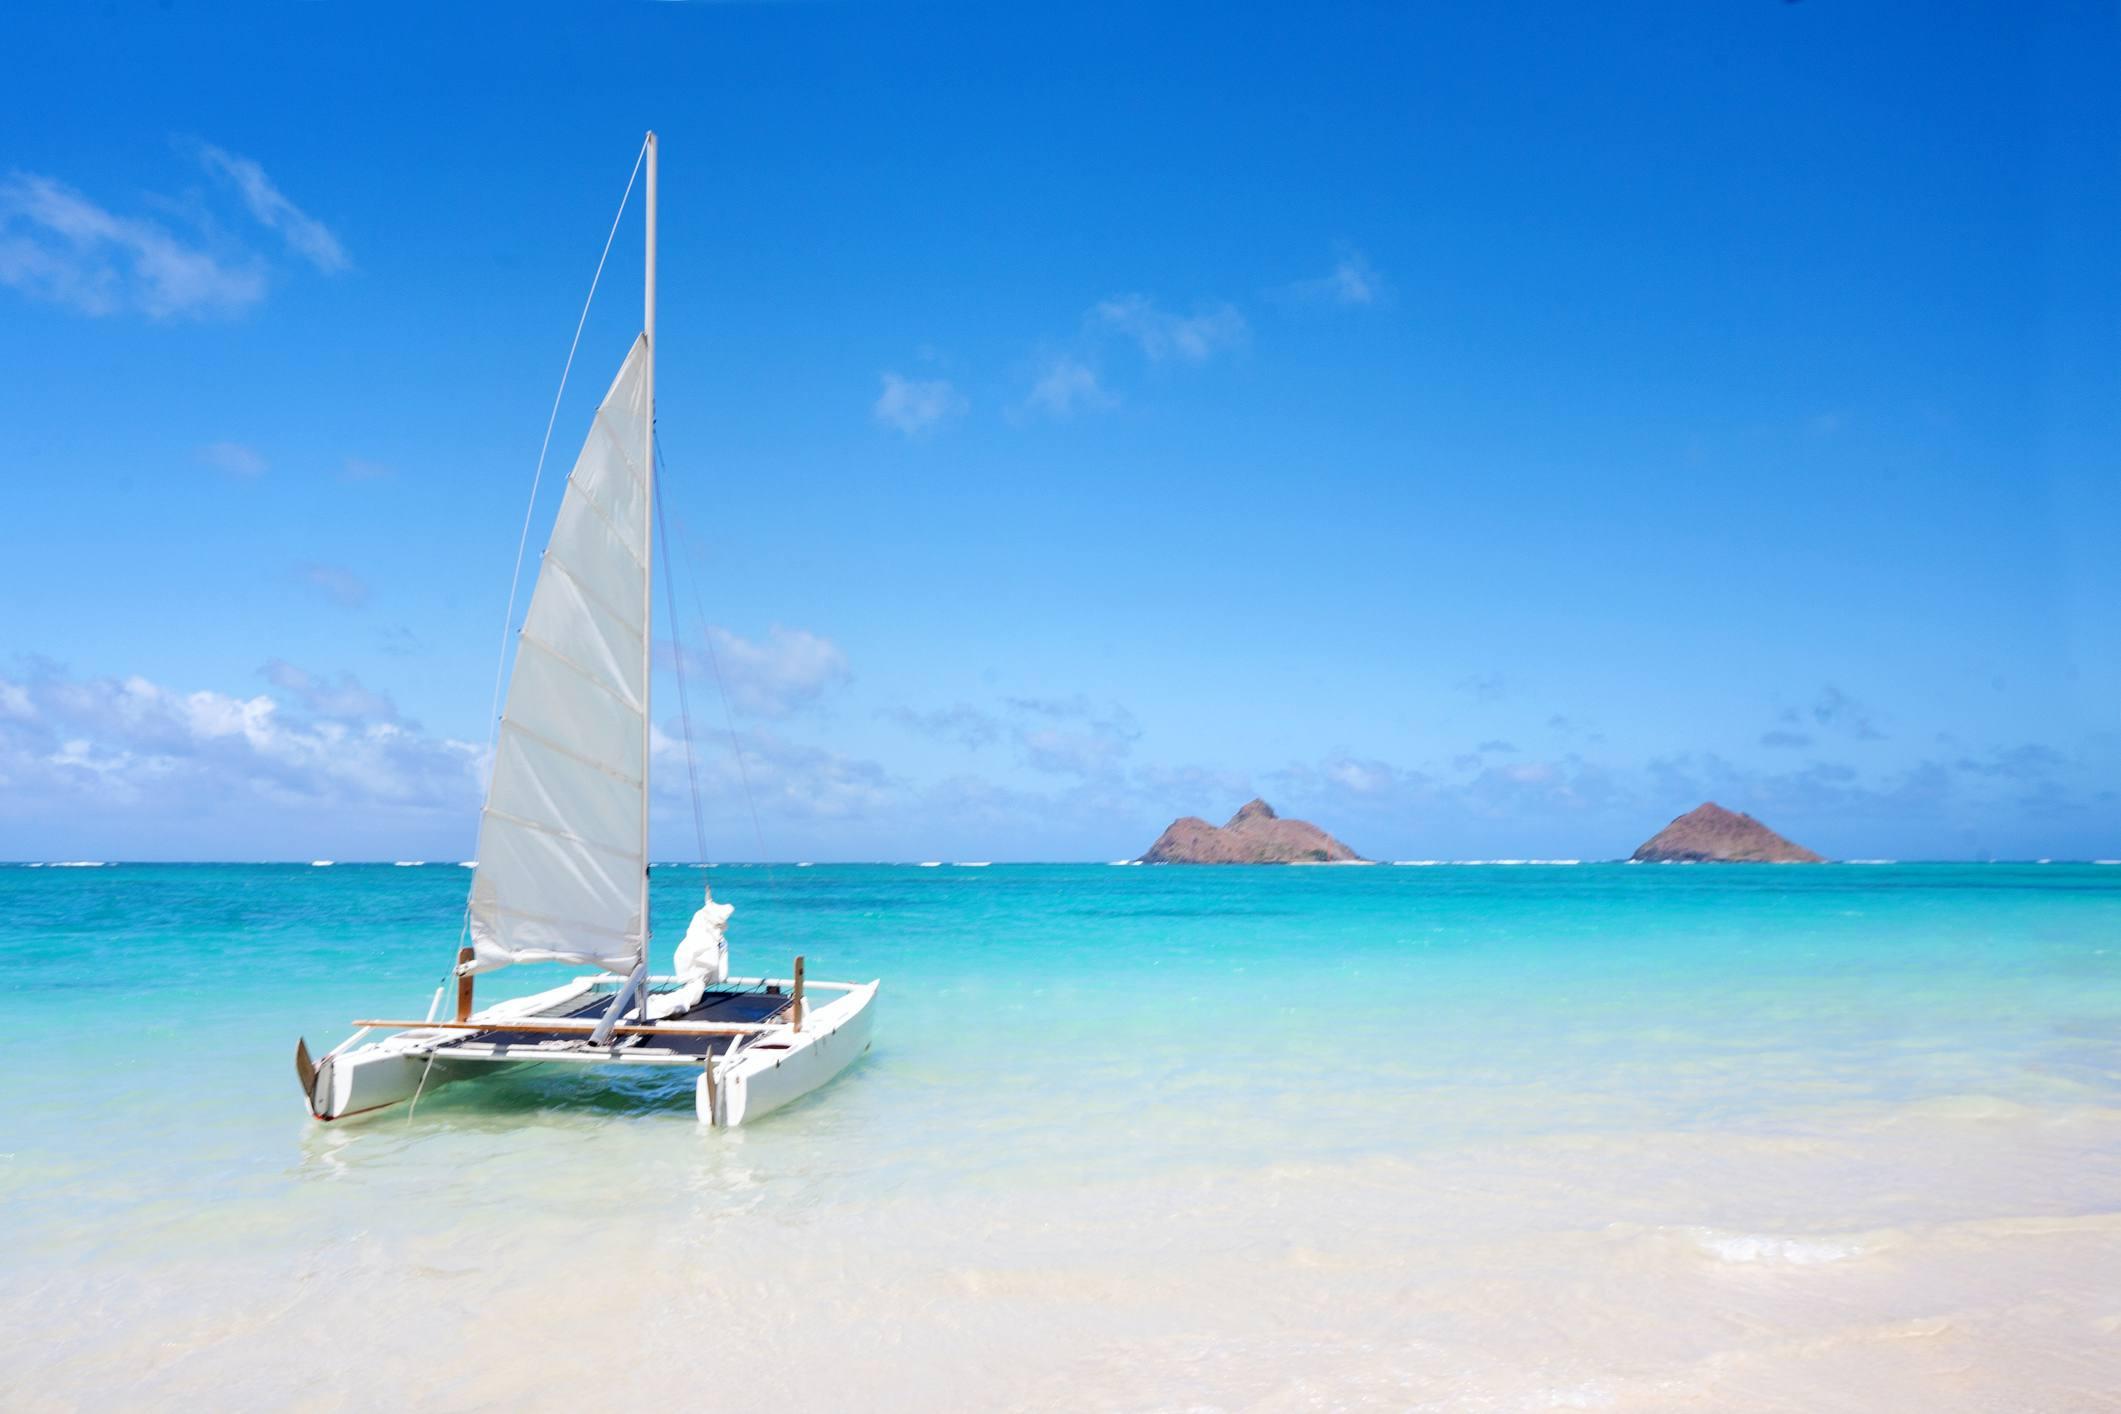 Sailboat at Lanikai Beach on beautiful day in Oahu, Hawaii.